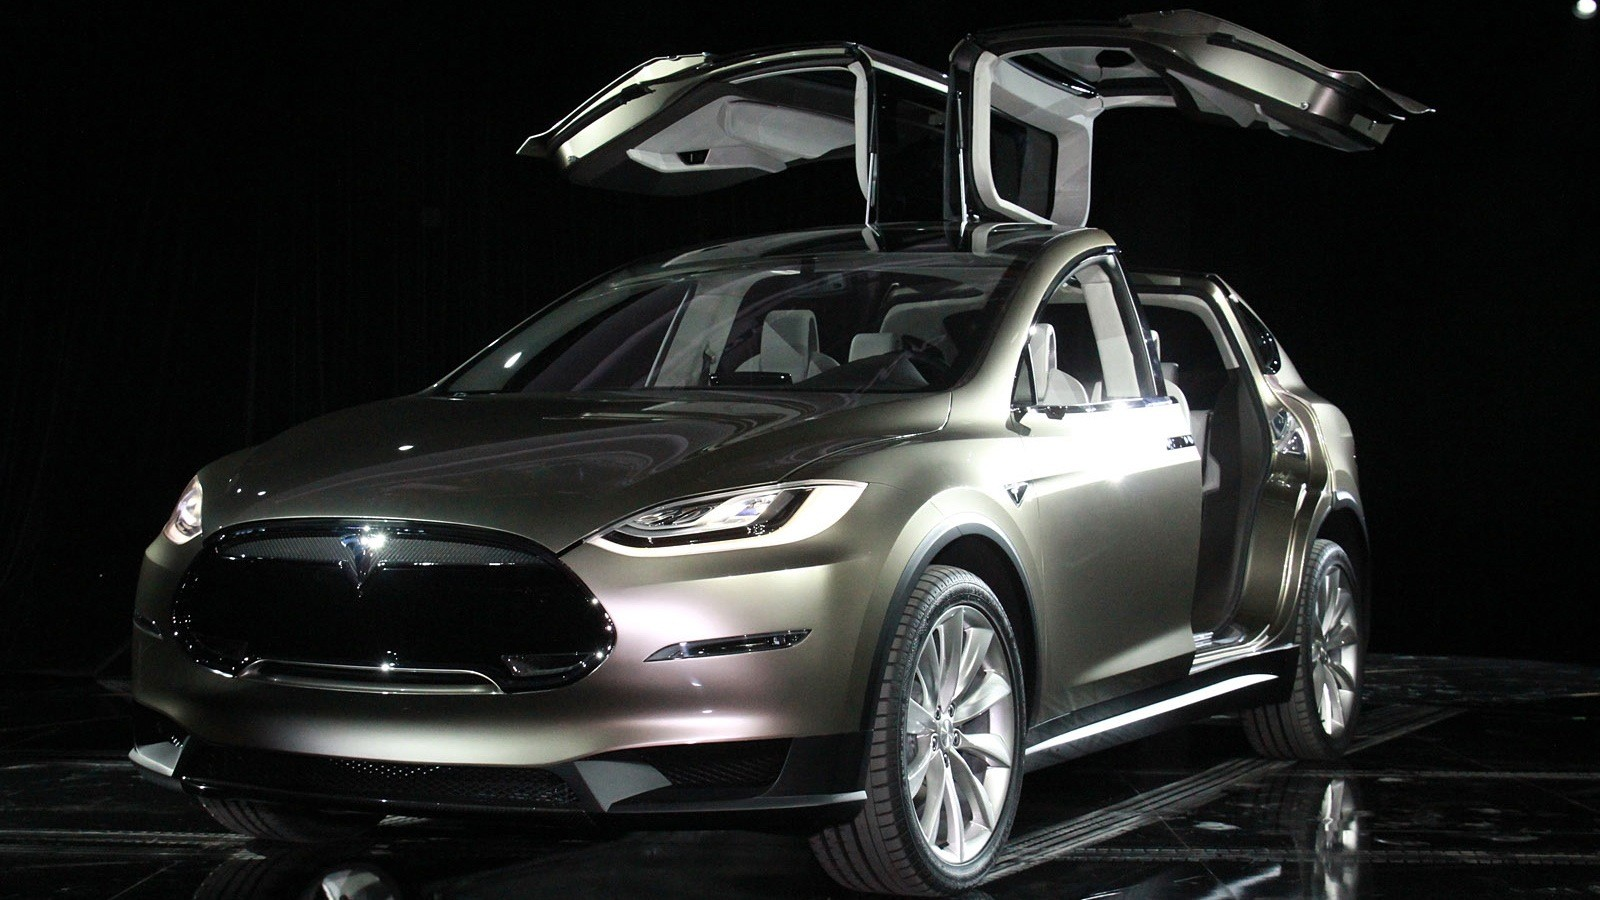 45] Tesla Screensavers and Wallpaper on WallpaperSafari 1600x900